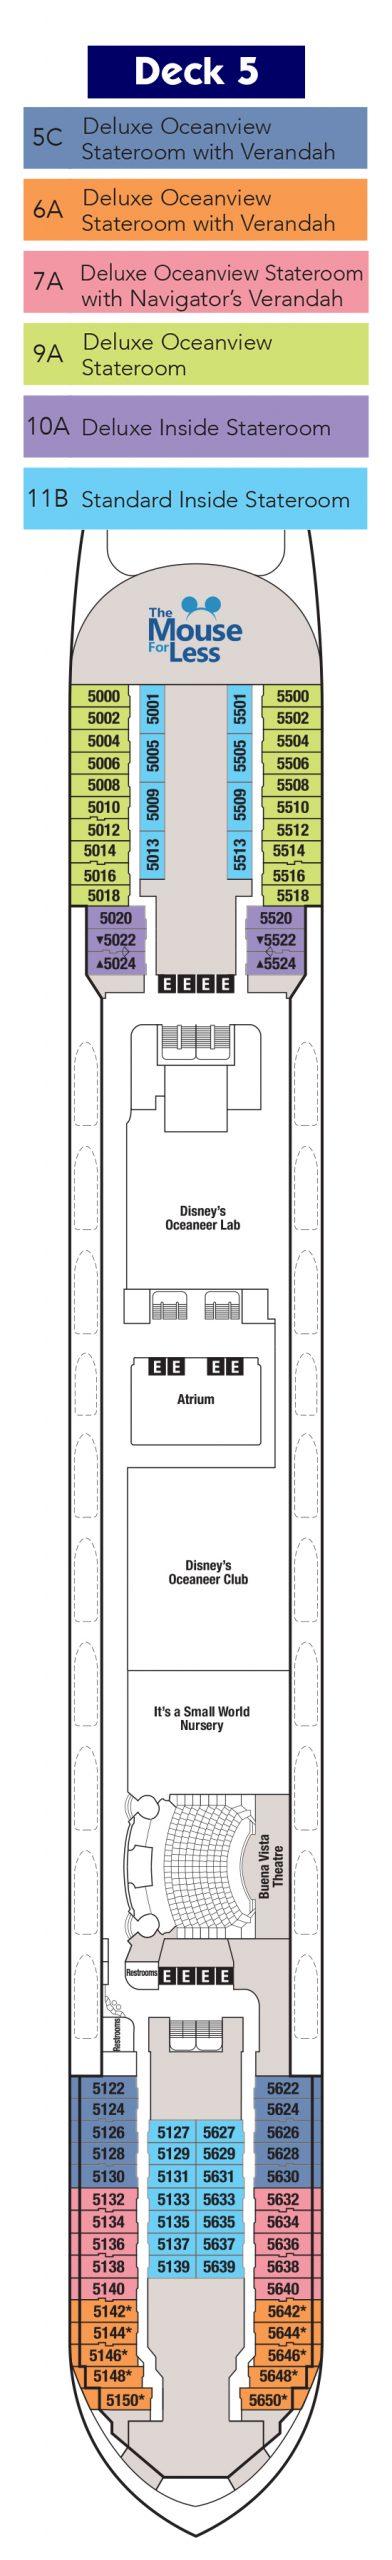 Disney Magic and Disney Wonder Deck 5 2022